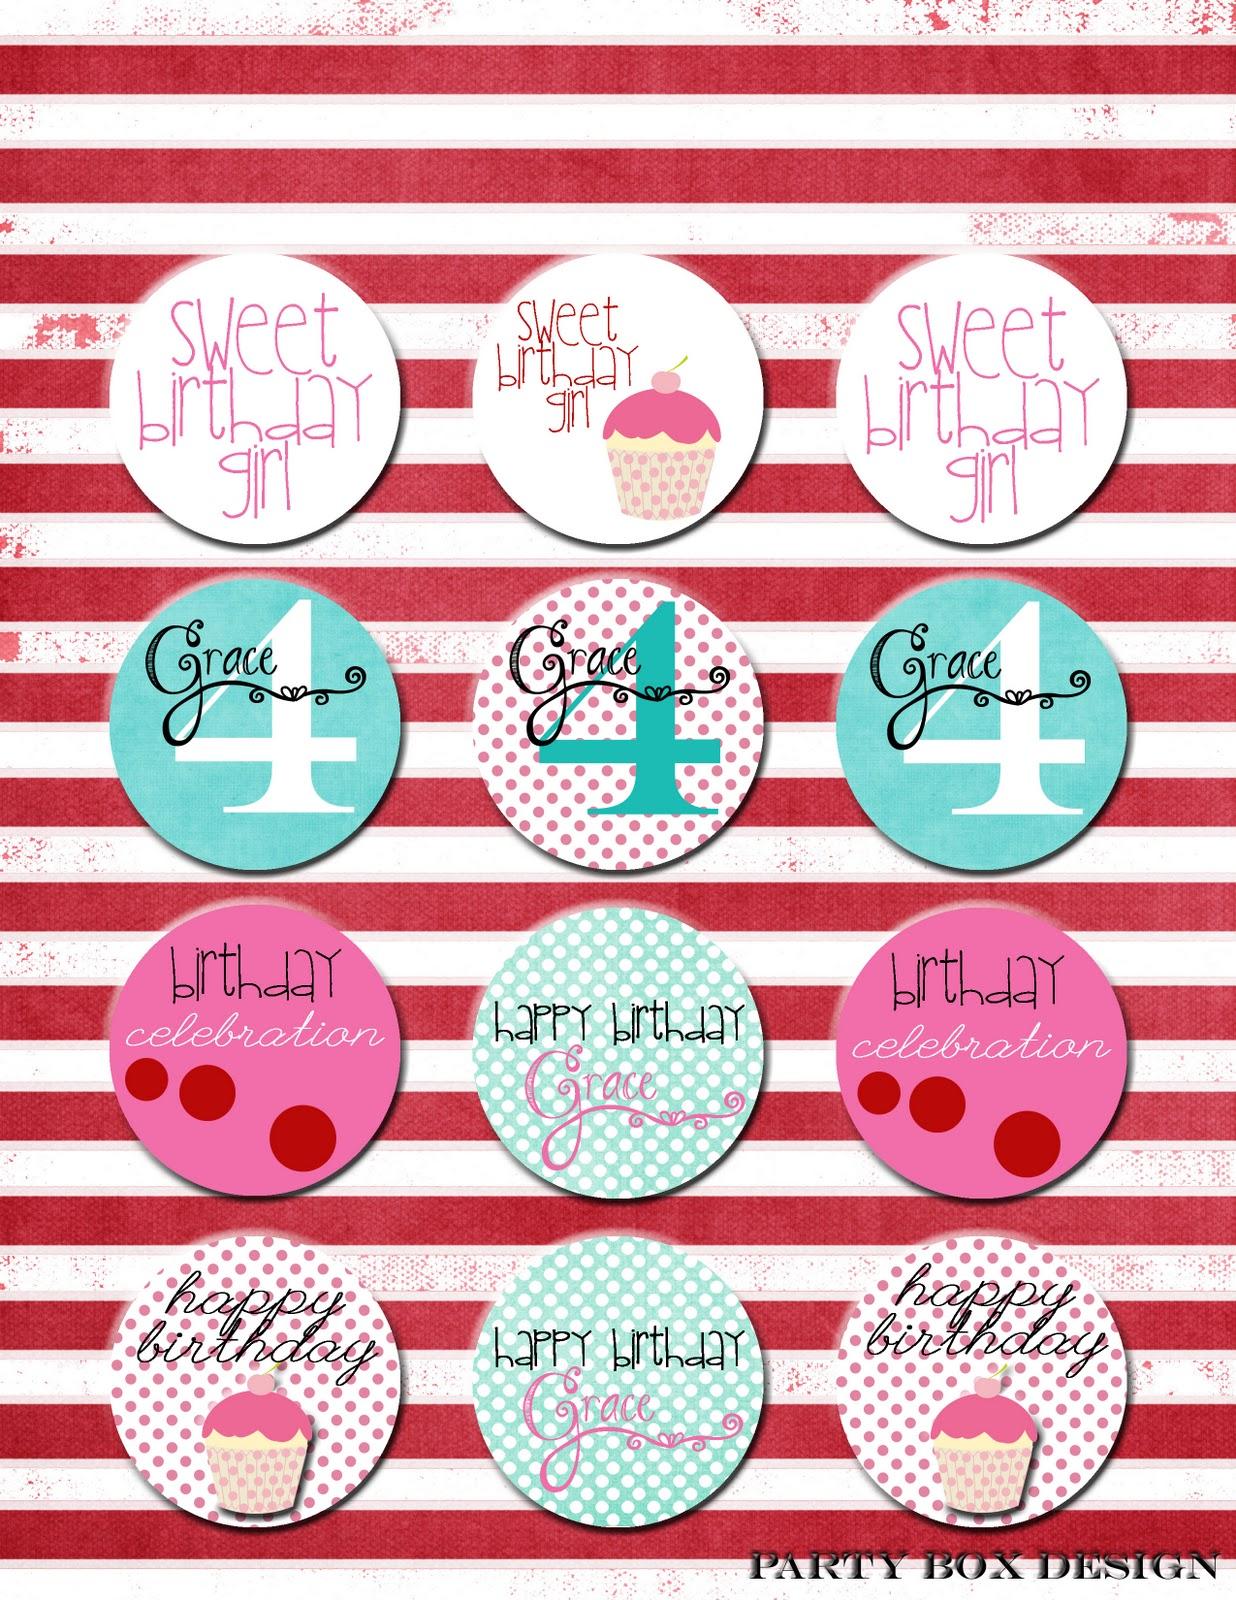 Party Box Design: February 2011